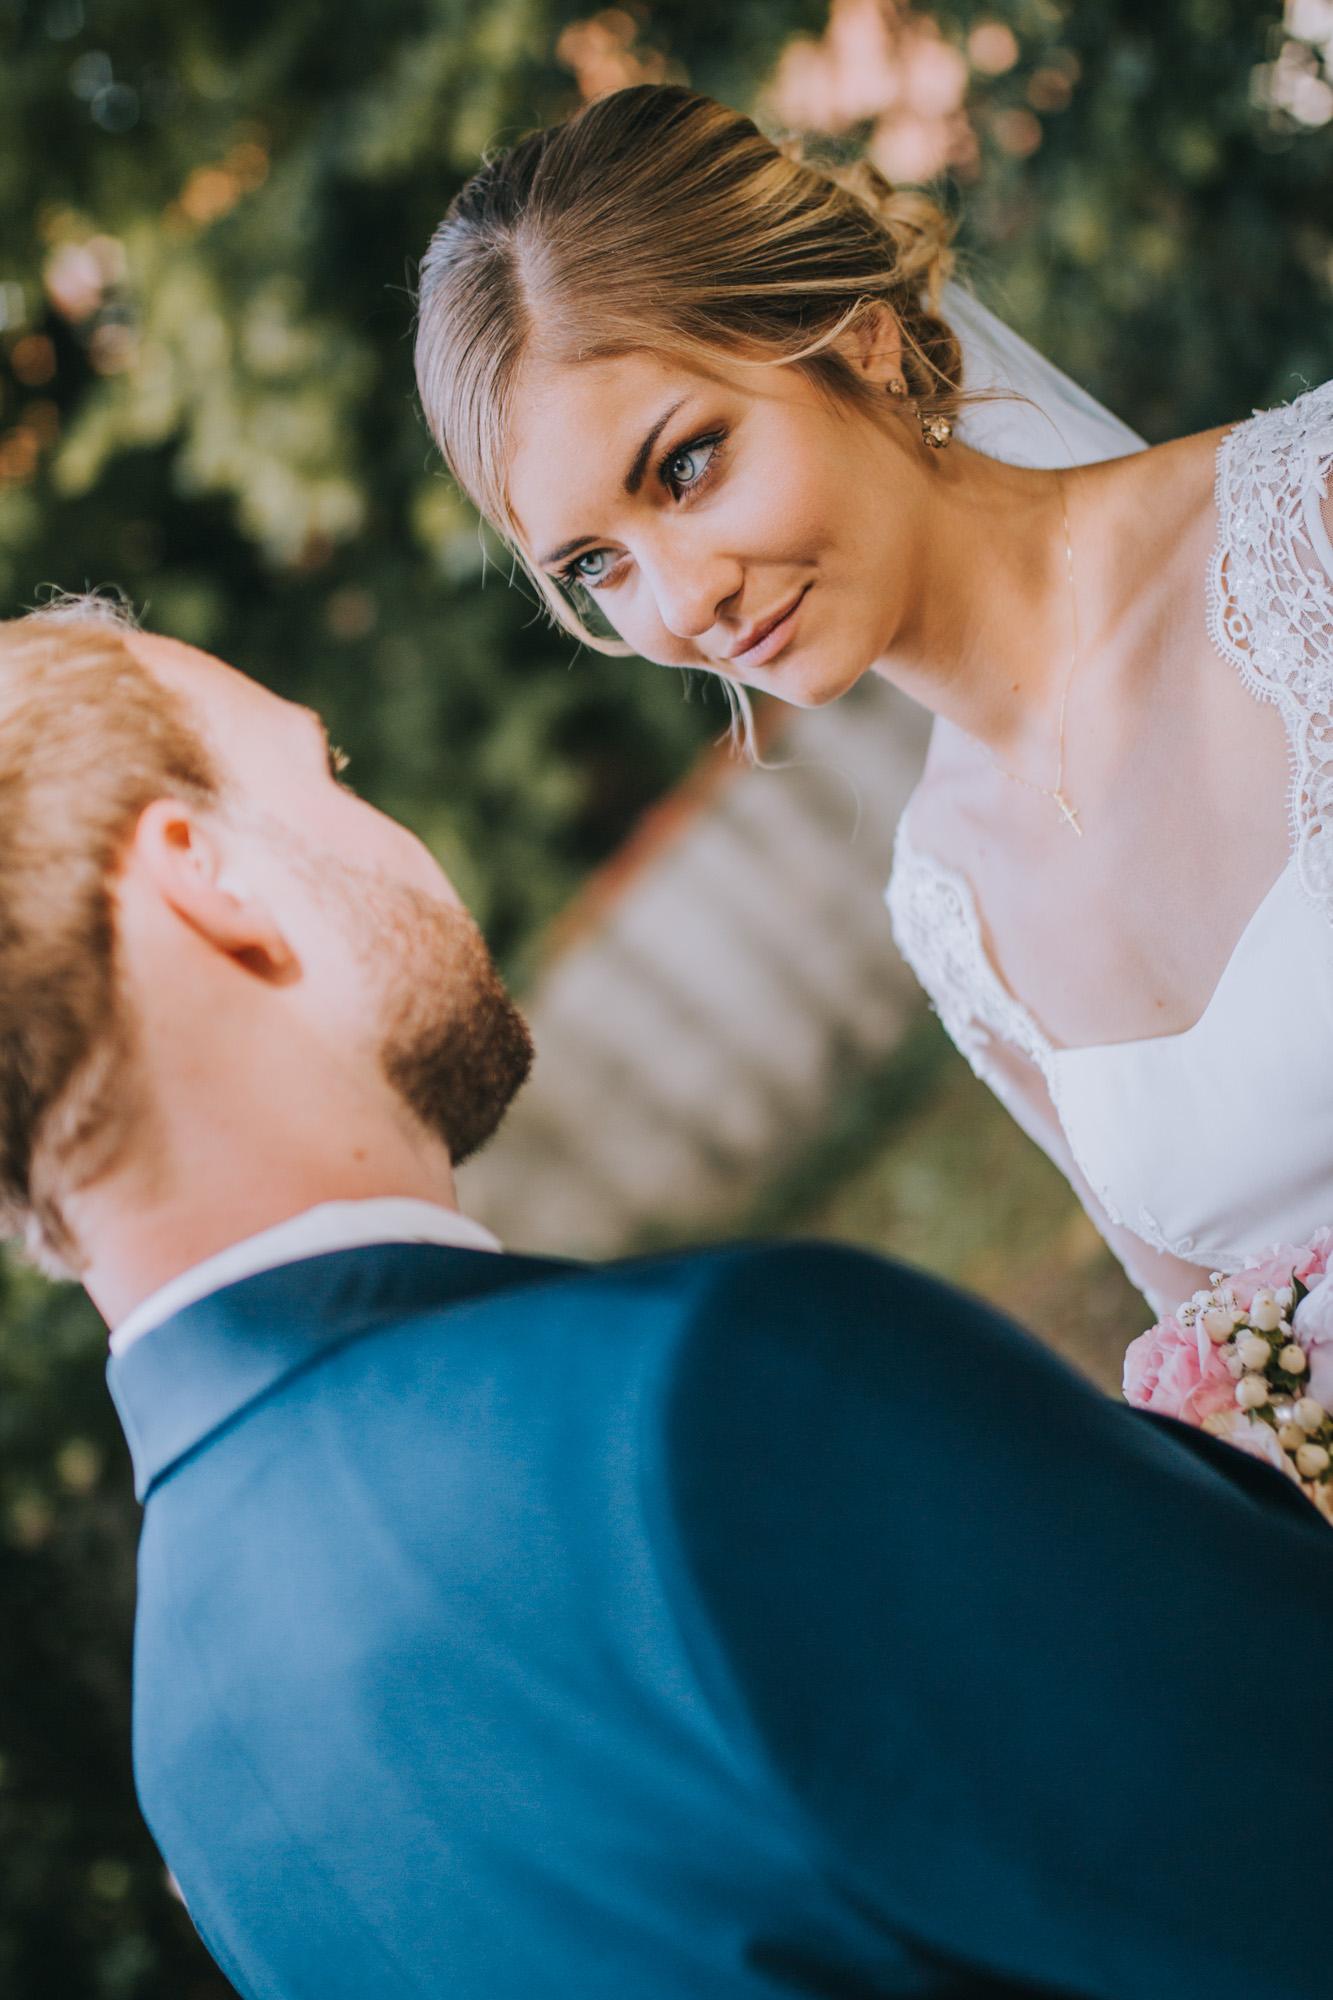 Hochzeit - Memory factory - 20180616-0055.jpg